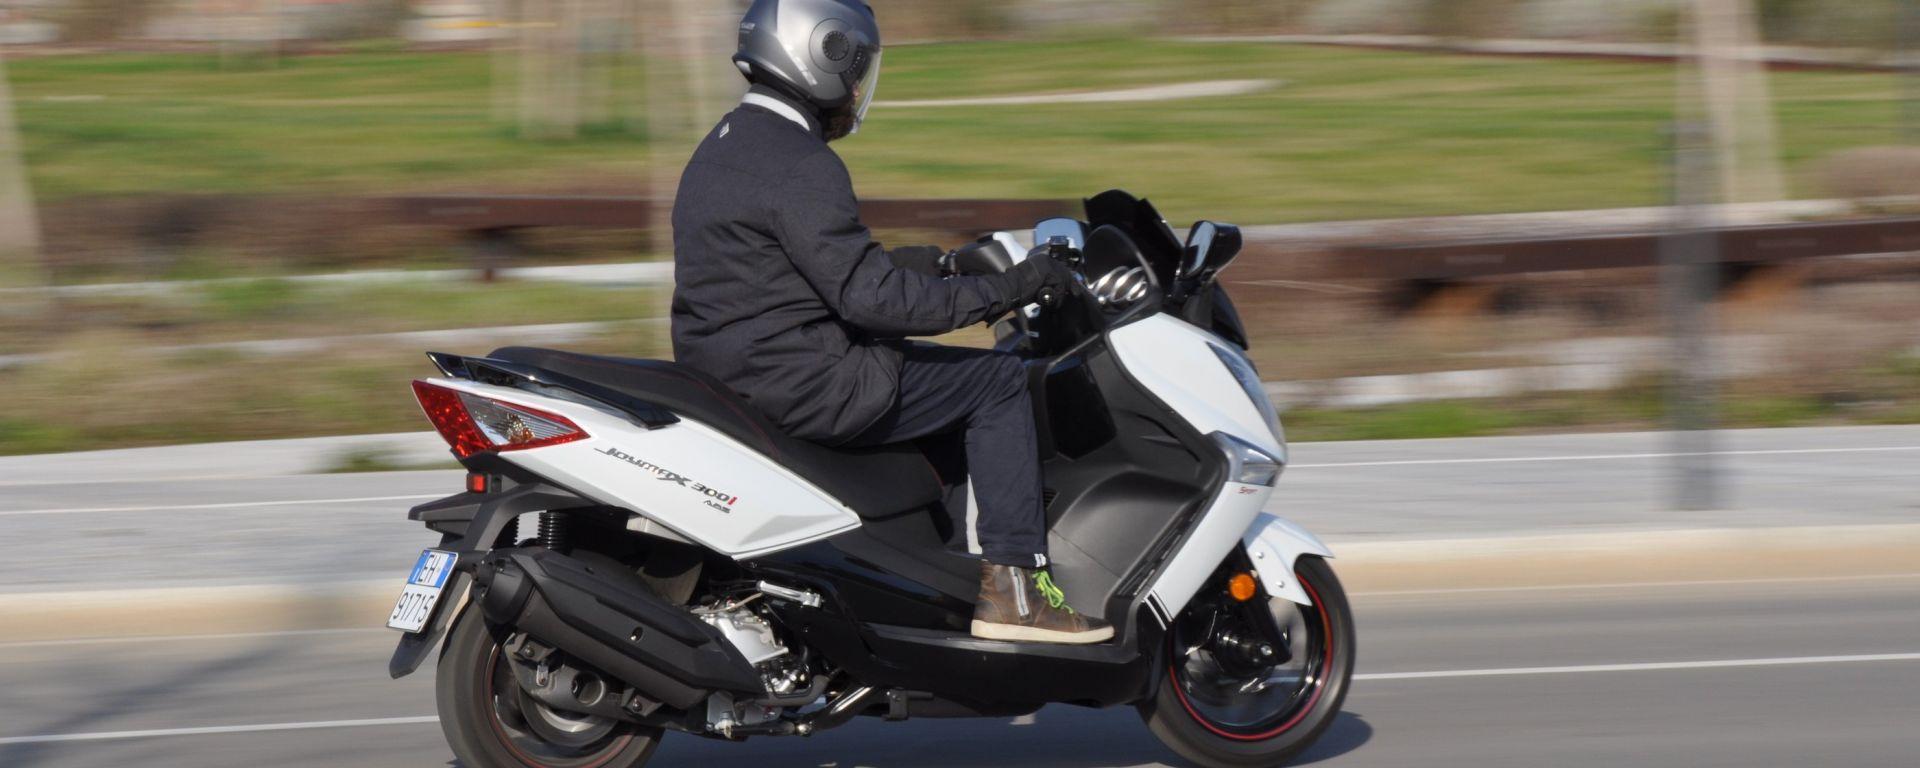 SYM Joymax 300i Sport, lo scooter che bada al sodo